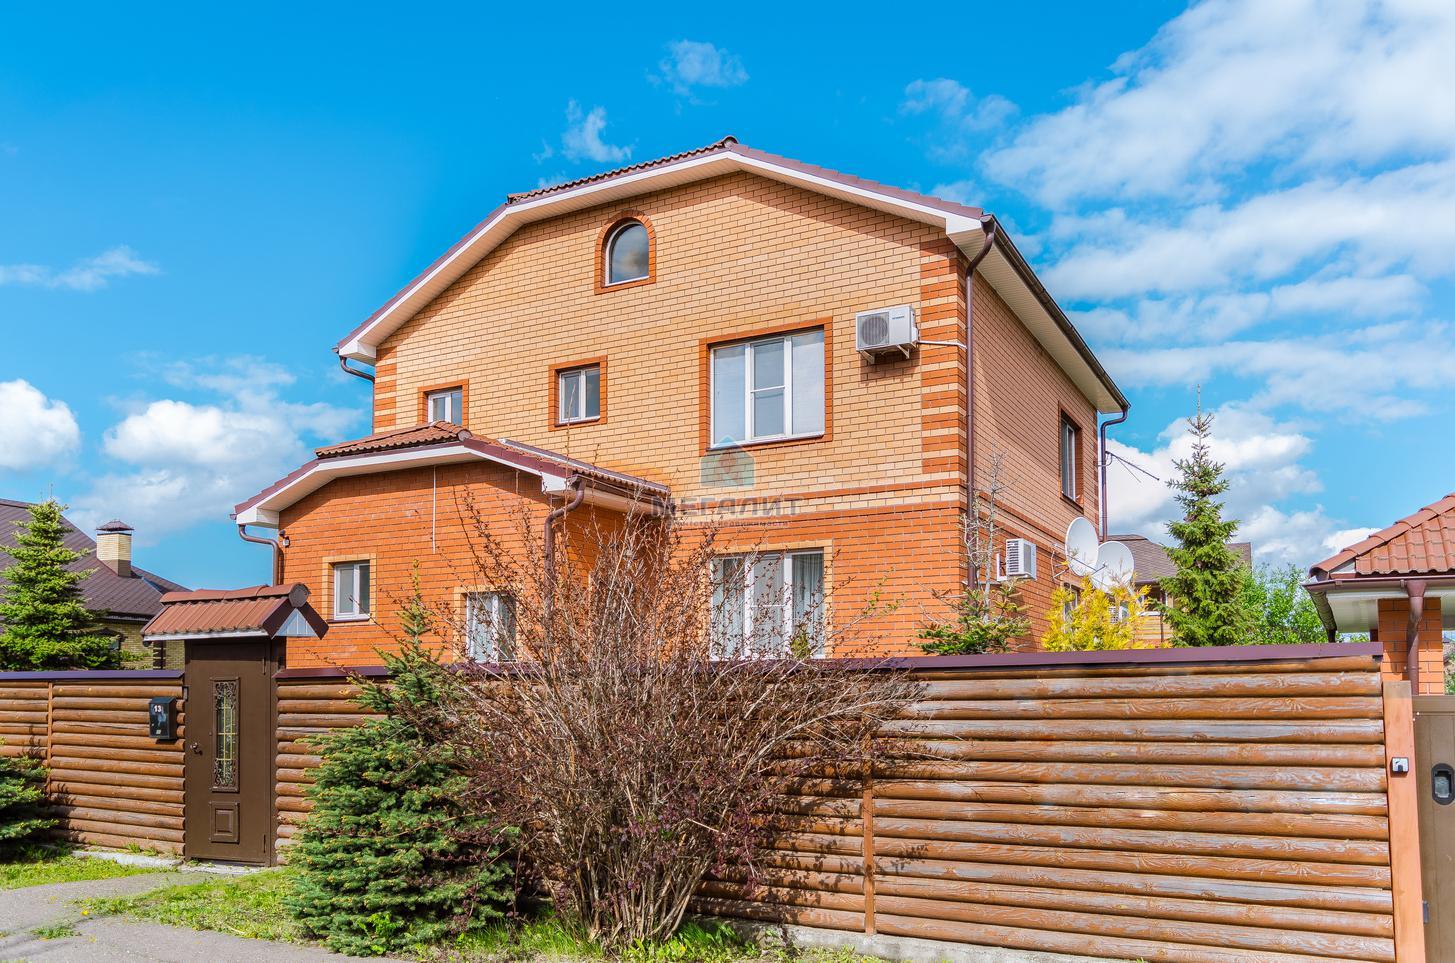 Продажа  дома Ромашковая, 242 м² (миниатюра №35)